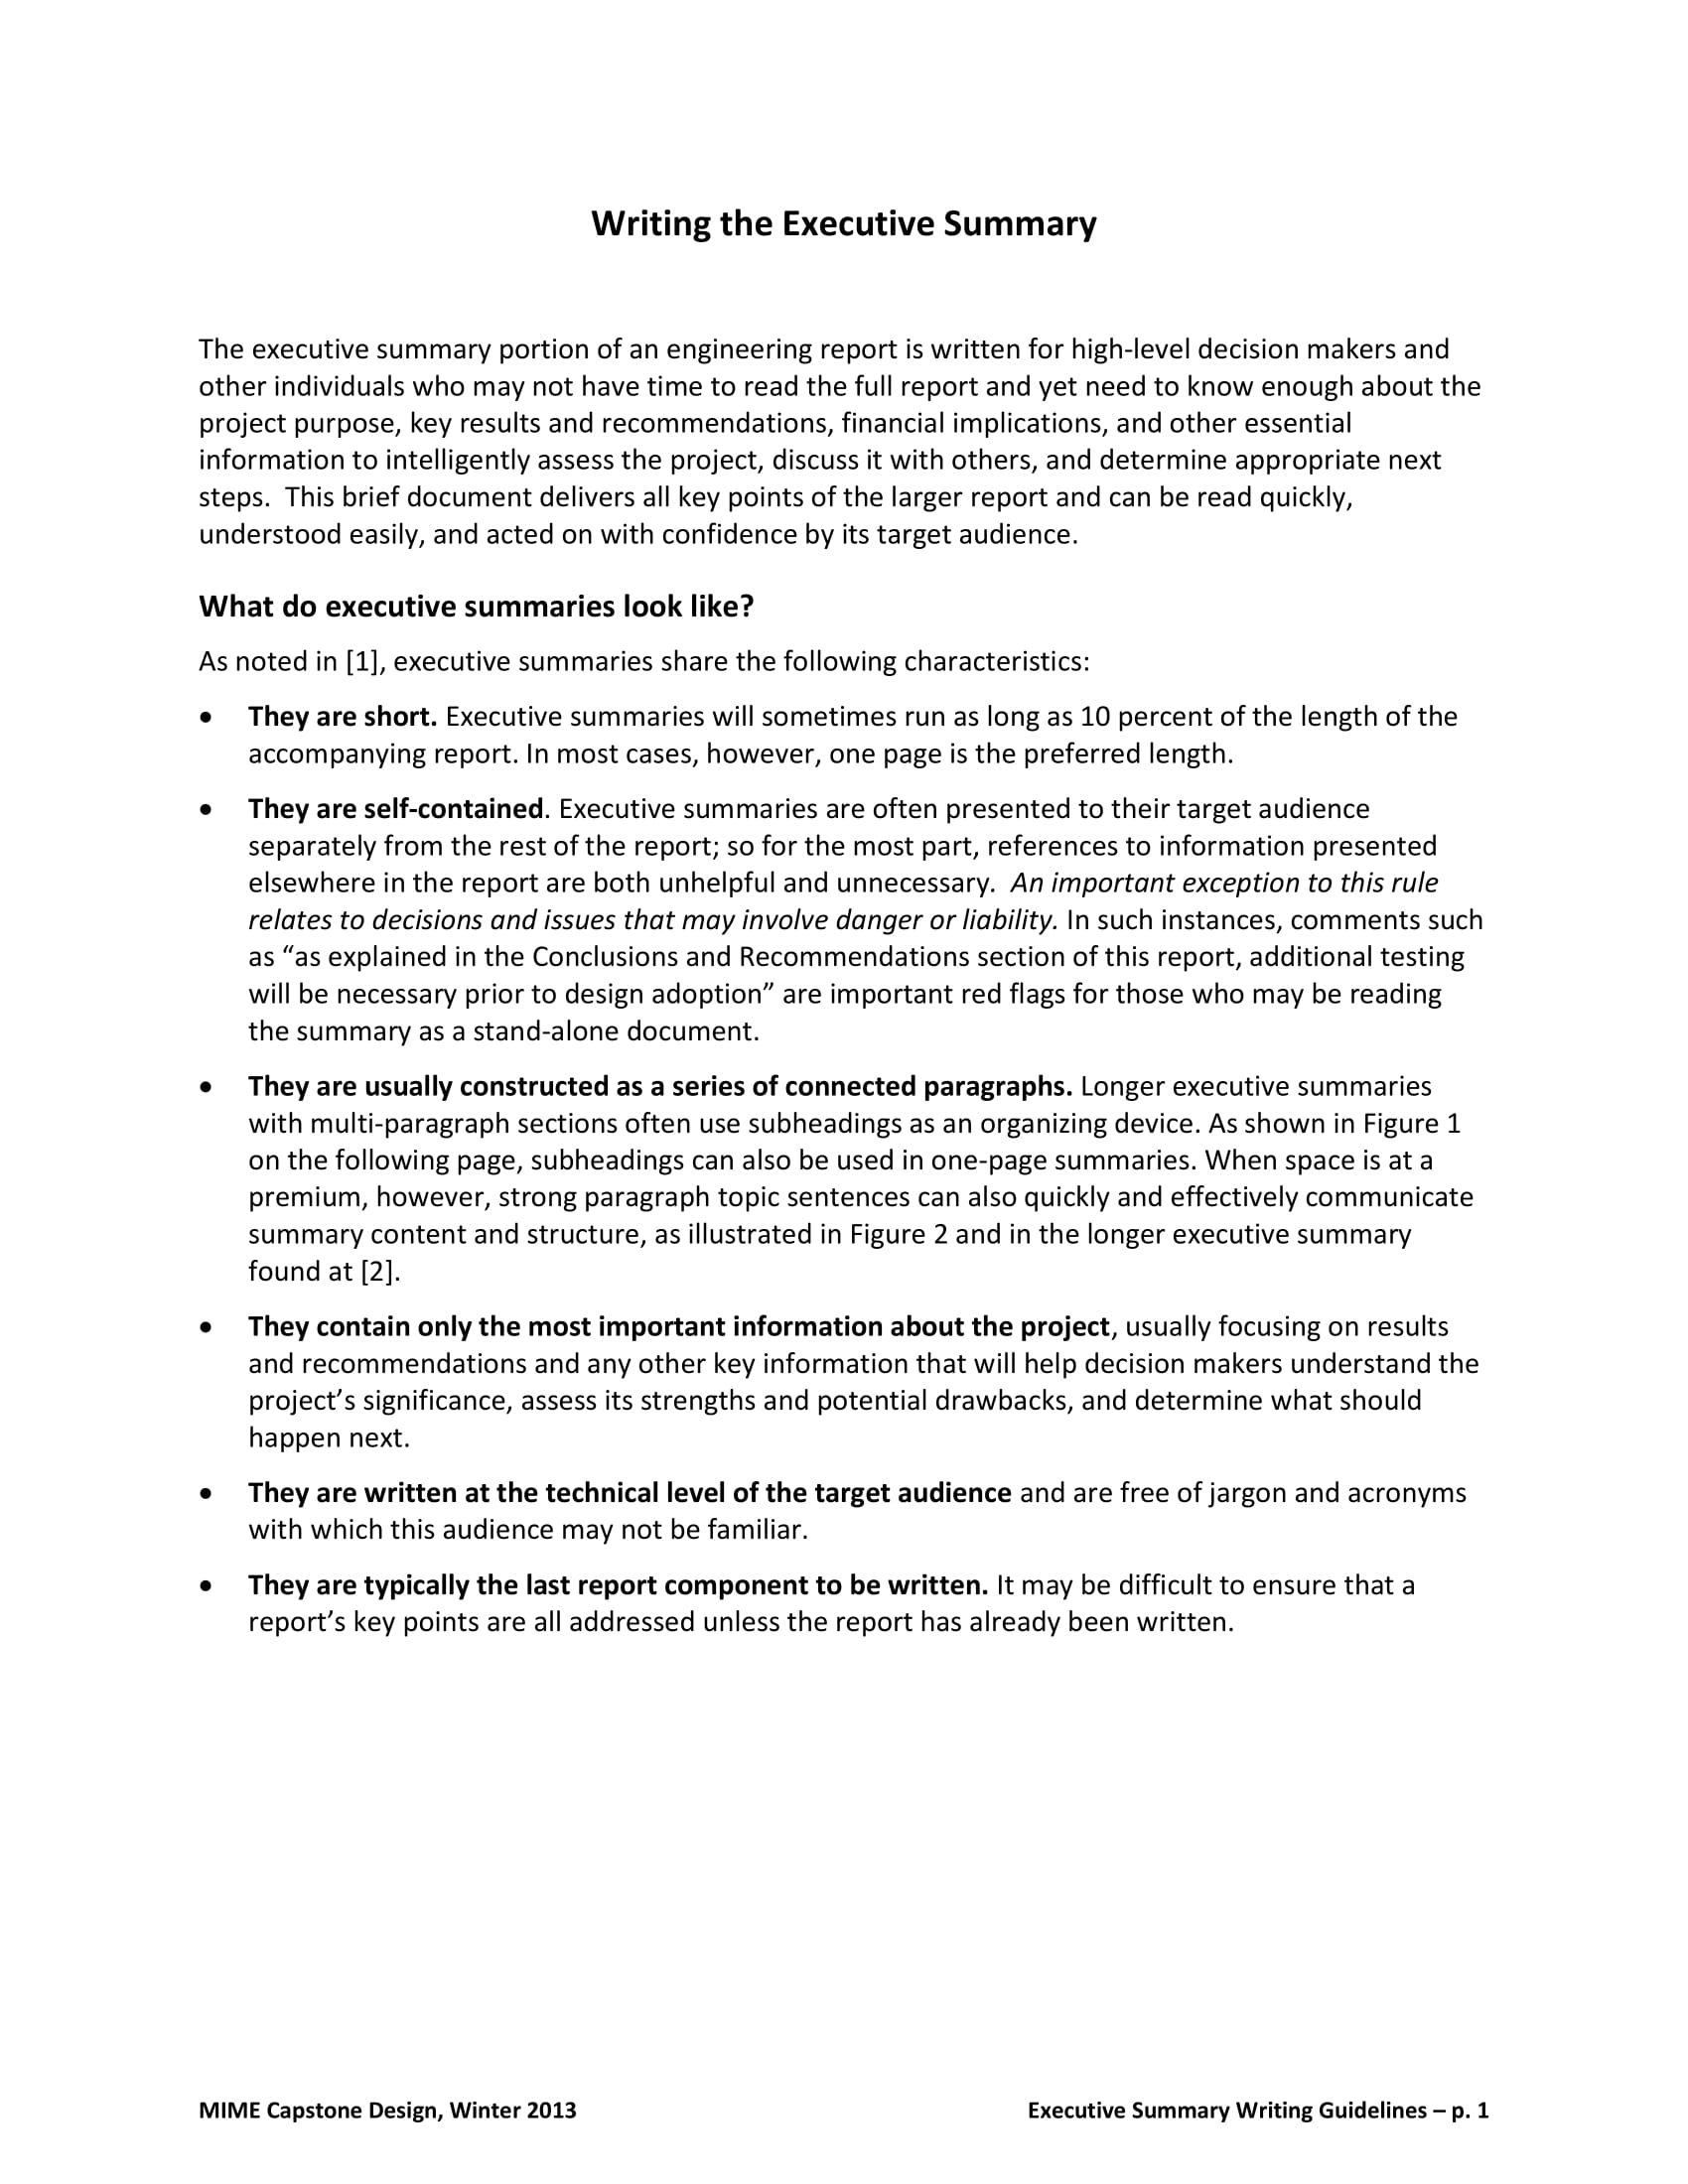 sample of a basic executive summary